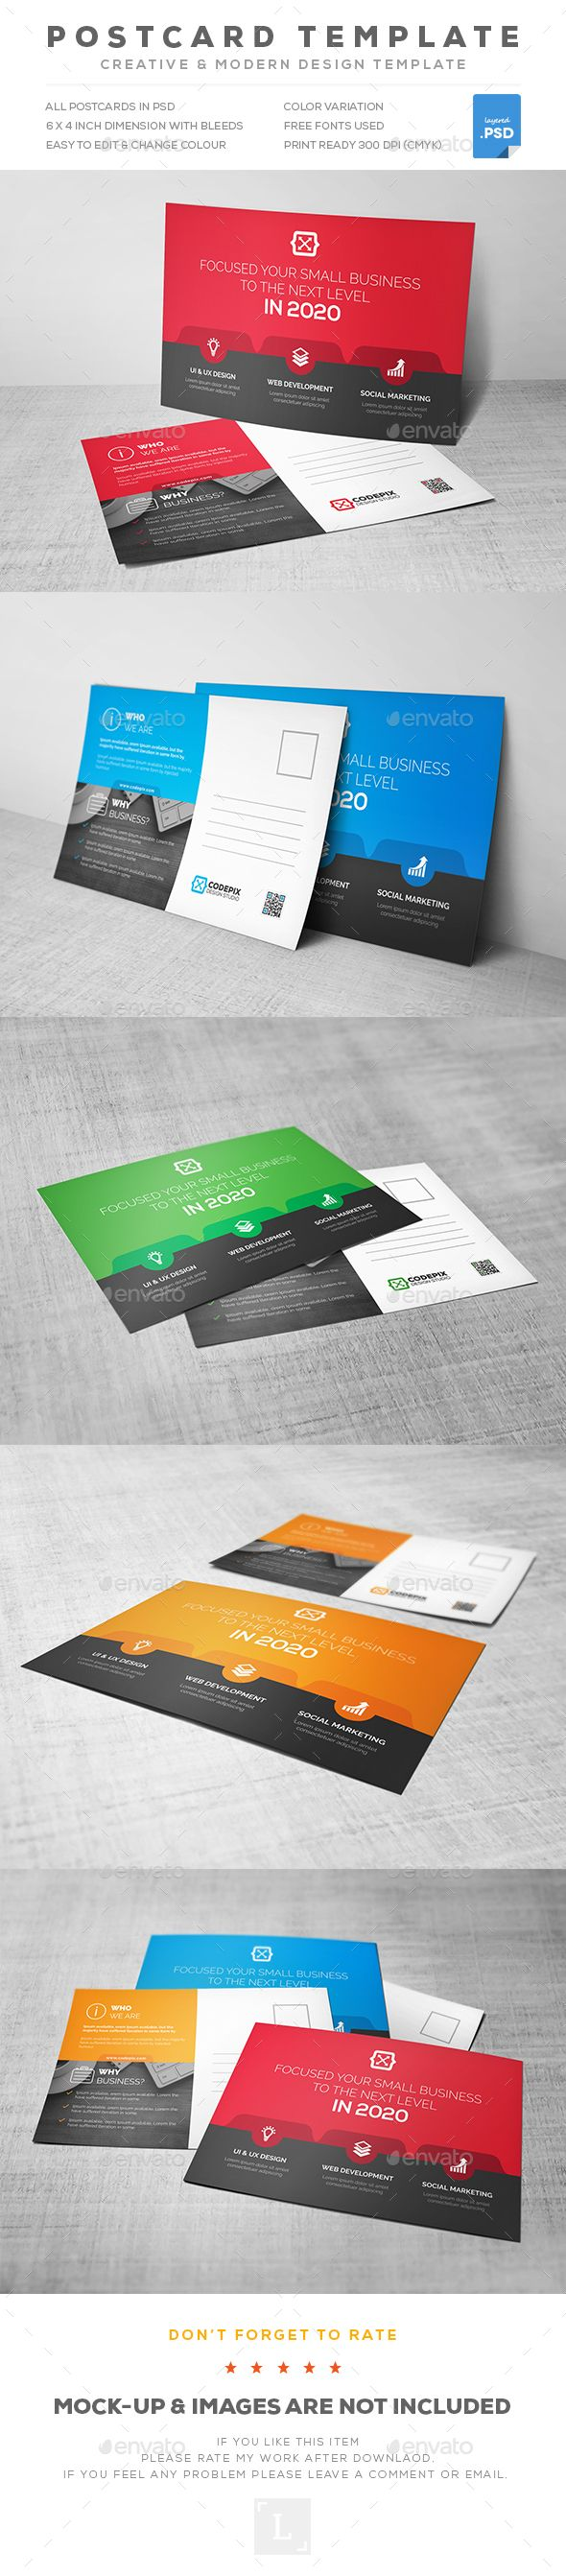 Postcard Template  — PSD Template #advertisement #marketing postcard • Download ➝ https://graphicriver.net/item/postcard-template/18264770?ref=pxcr